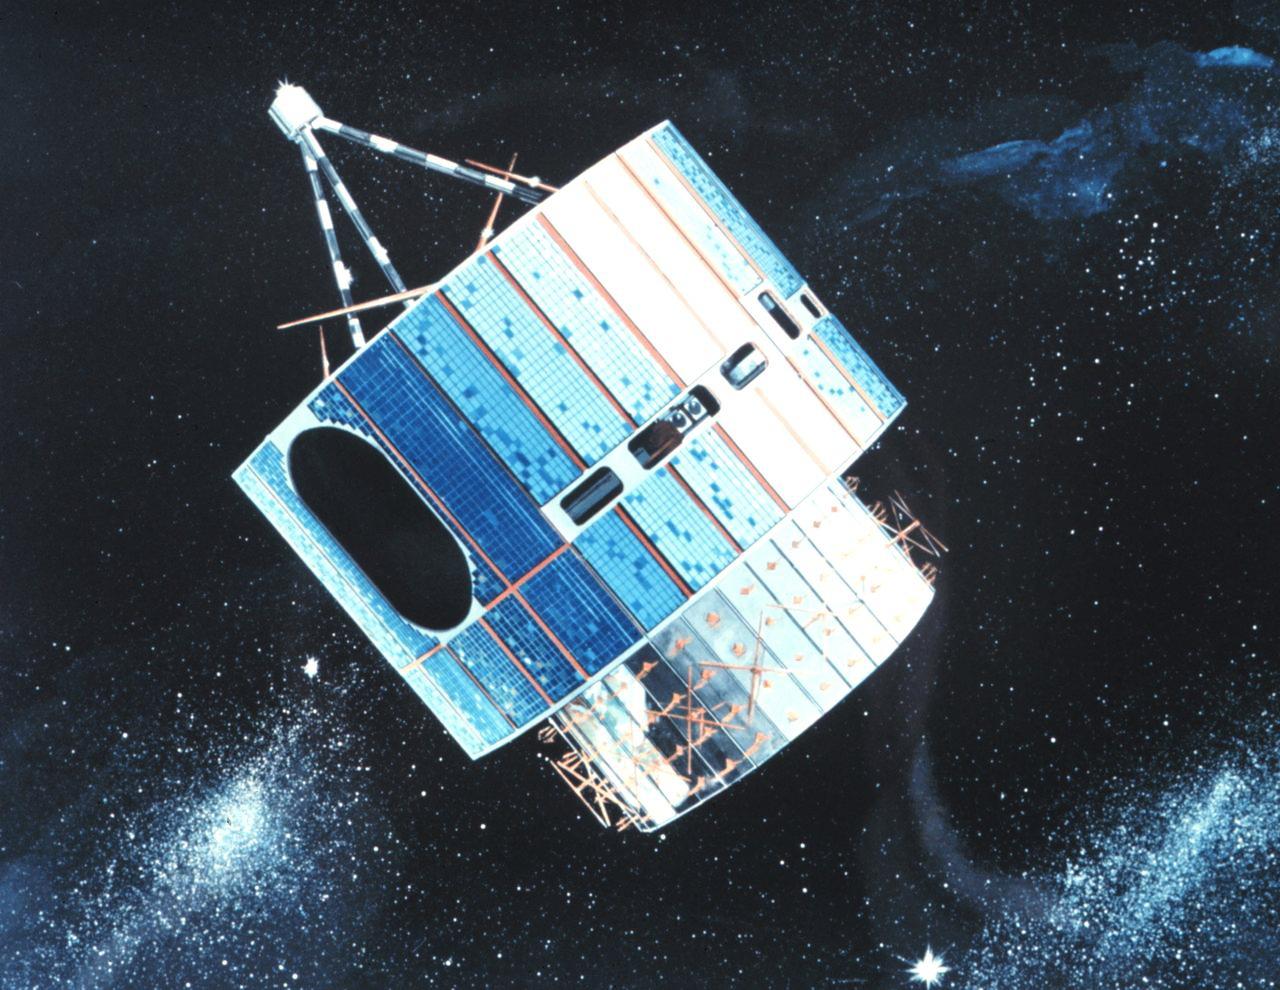 GOES 2 weather satellite, NASA illustration Source: NSSDCA Master Catalog goes_1.jpg